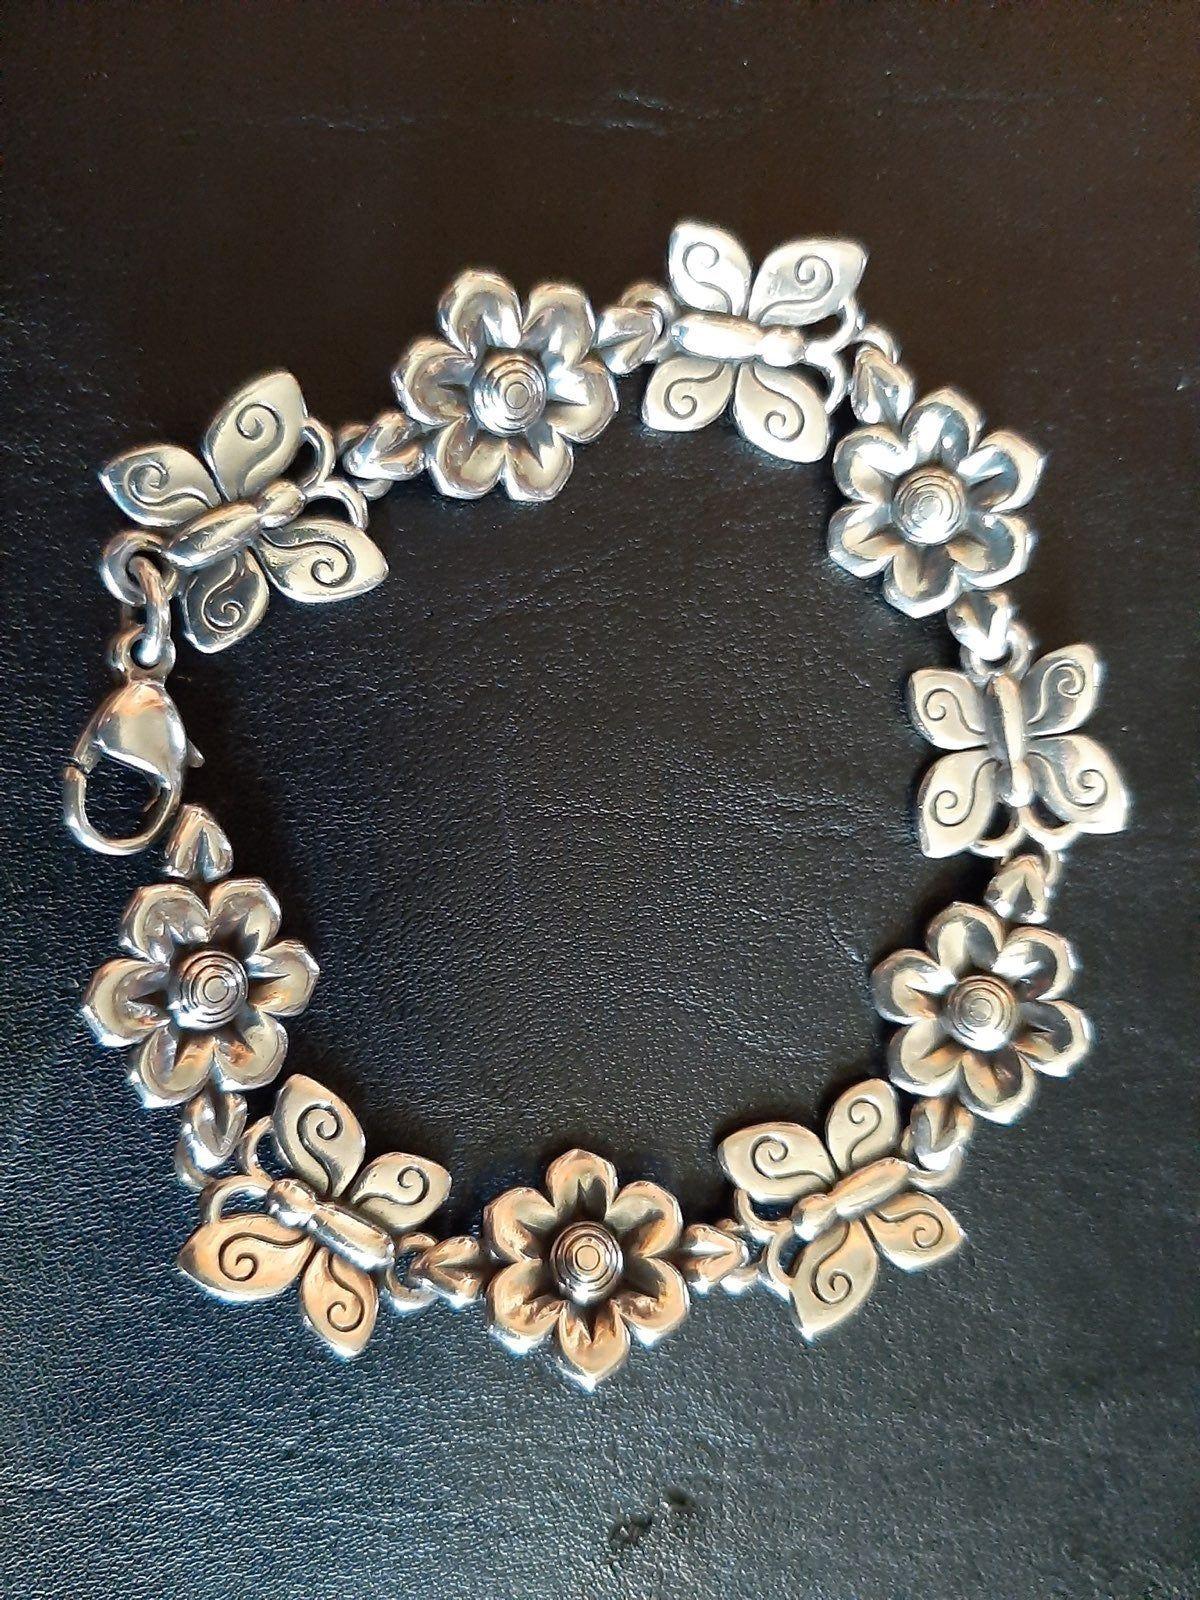 James avery flowerbutterflies bracelet in 2020 james